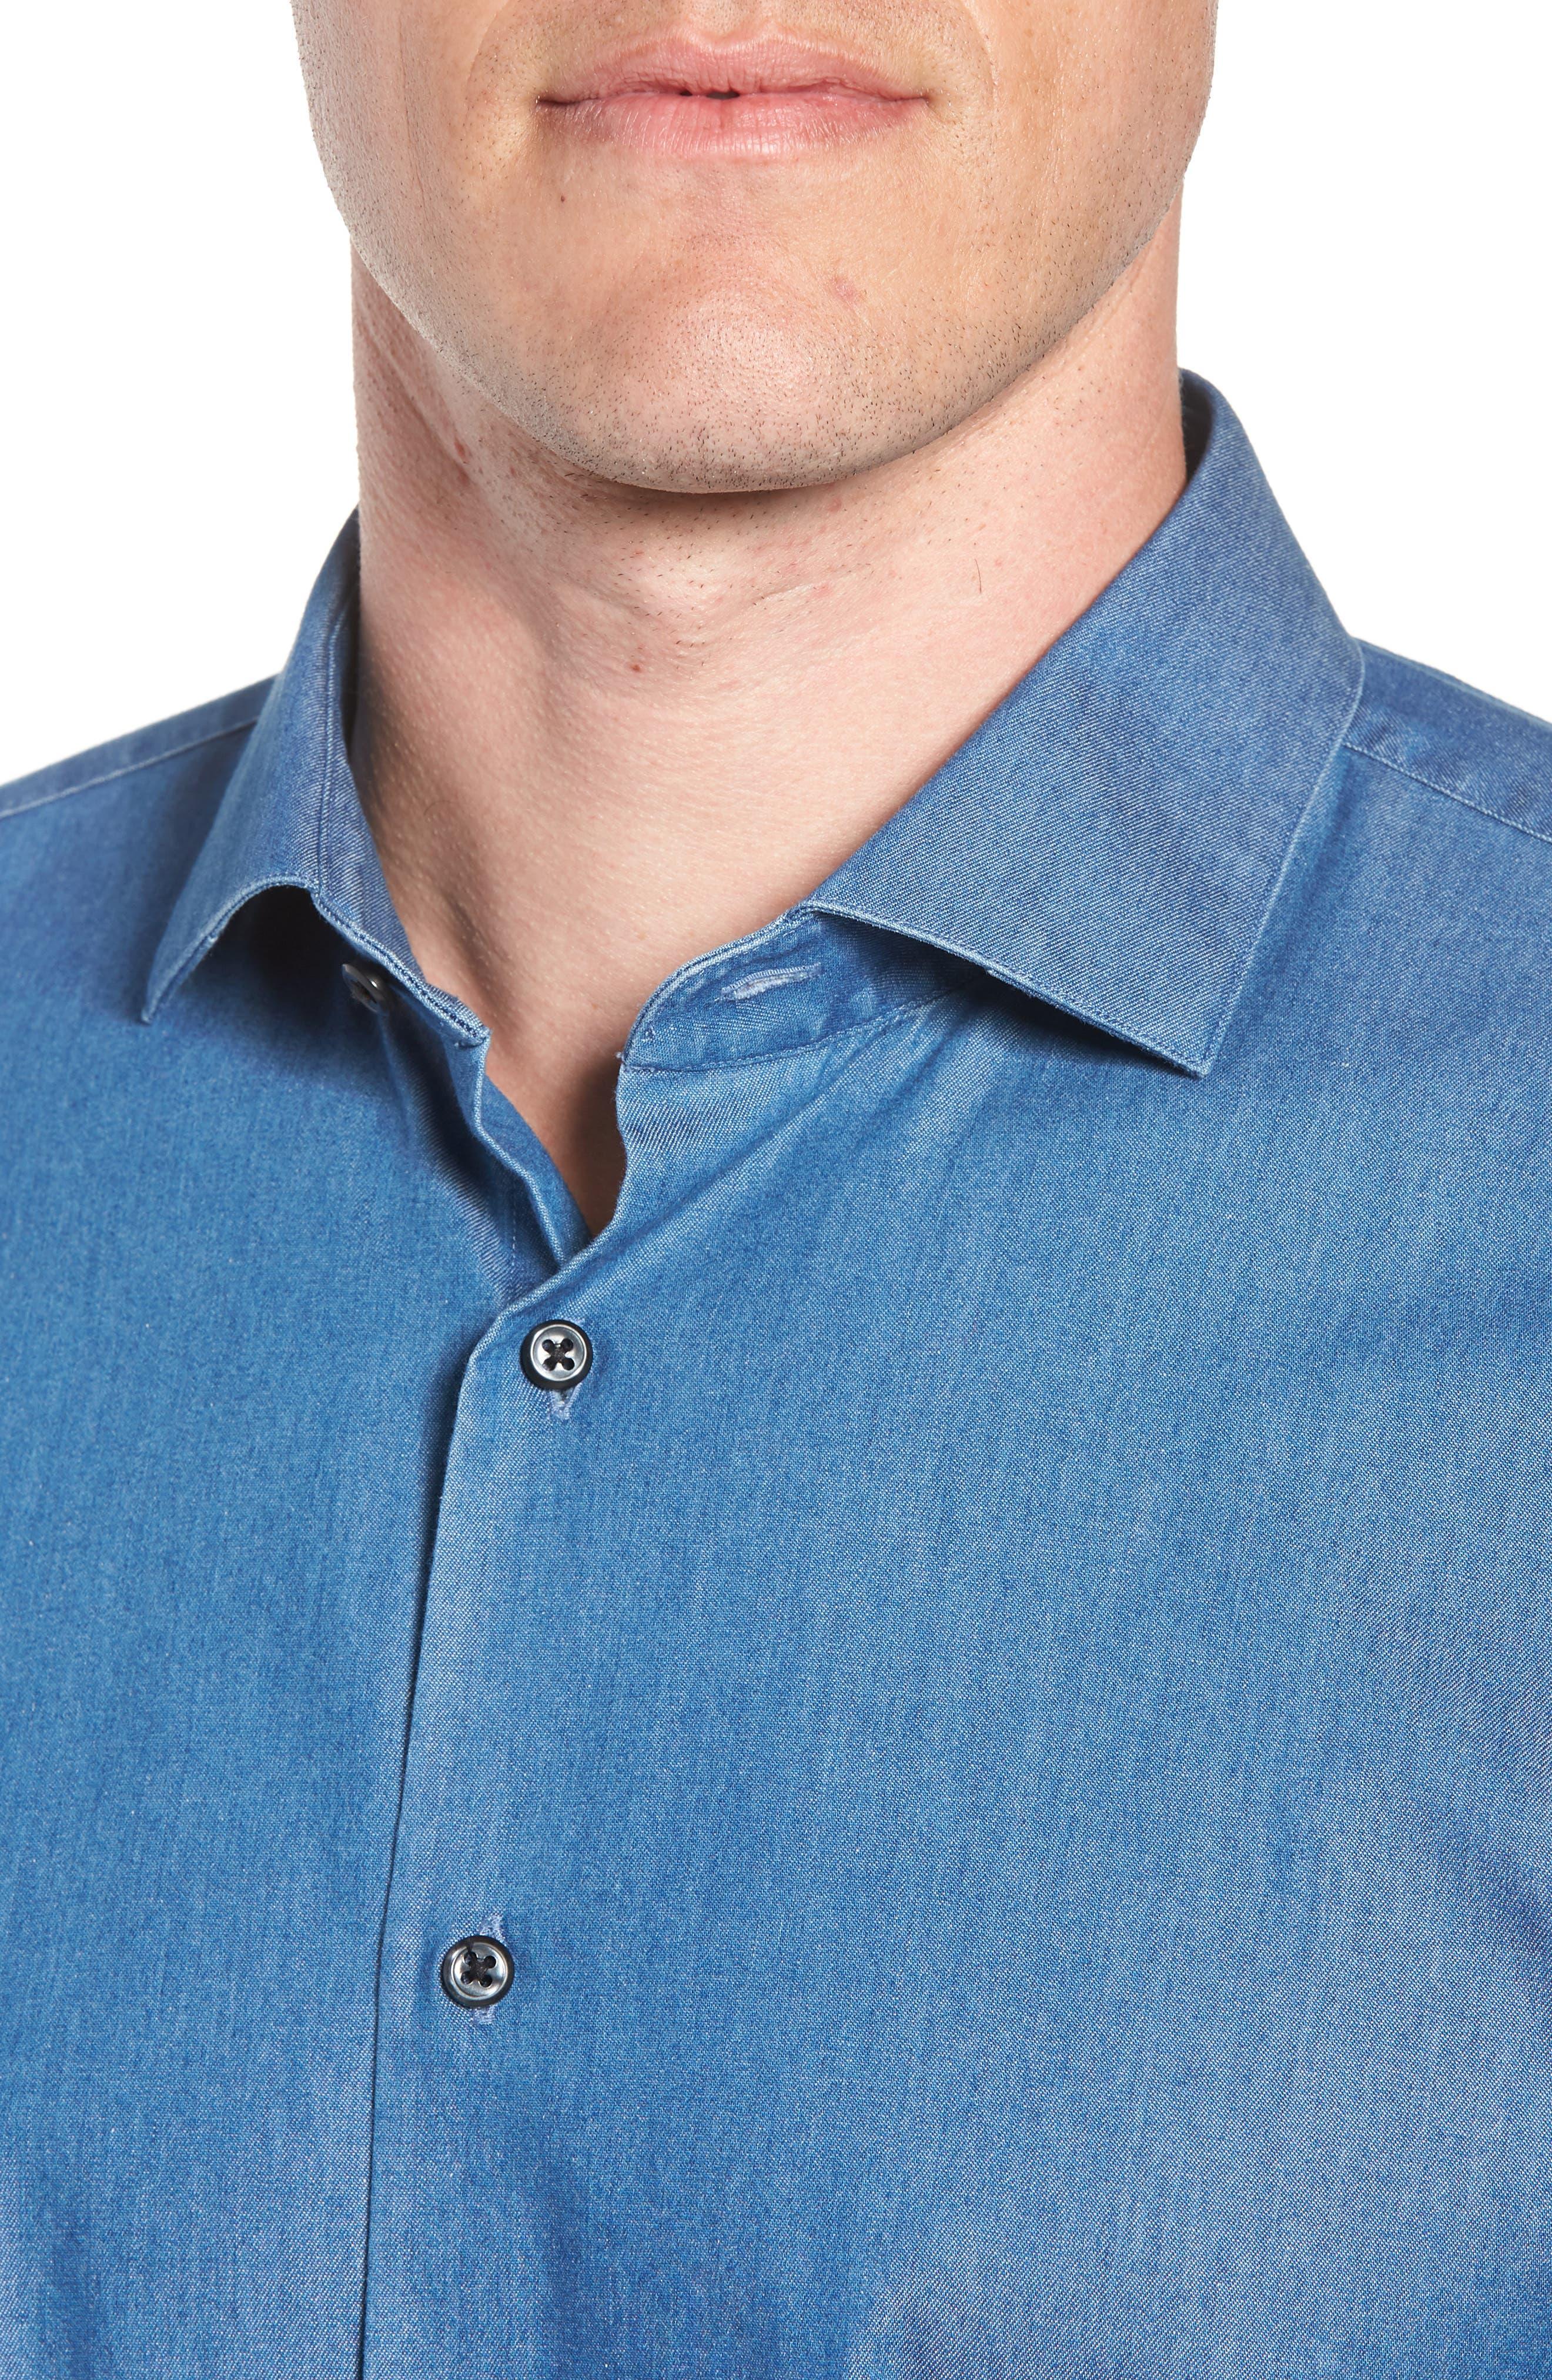 Trim Fit Solid Denim Dress Shirt,                             Alternate thumbnail 2, color,                             BLUE DENIM